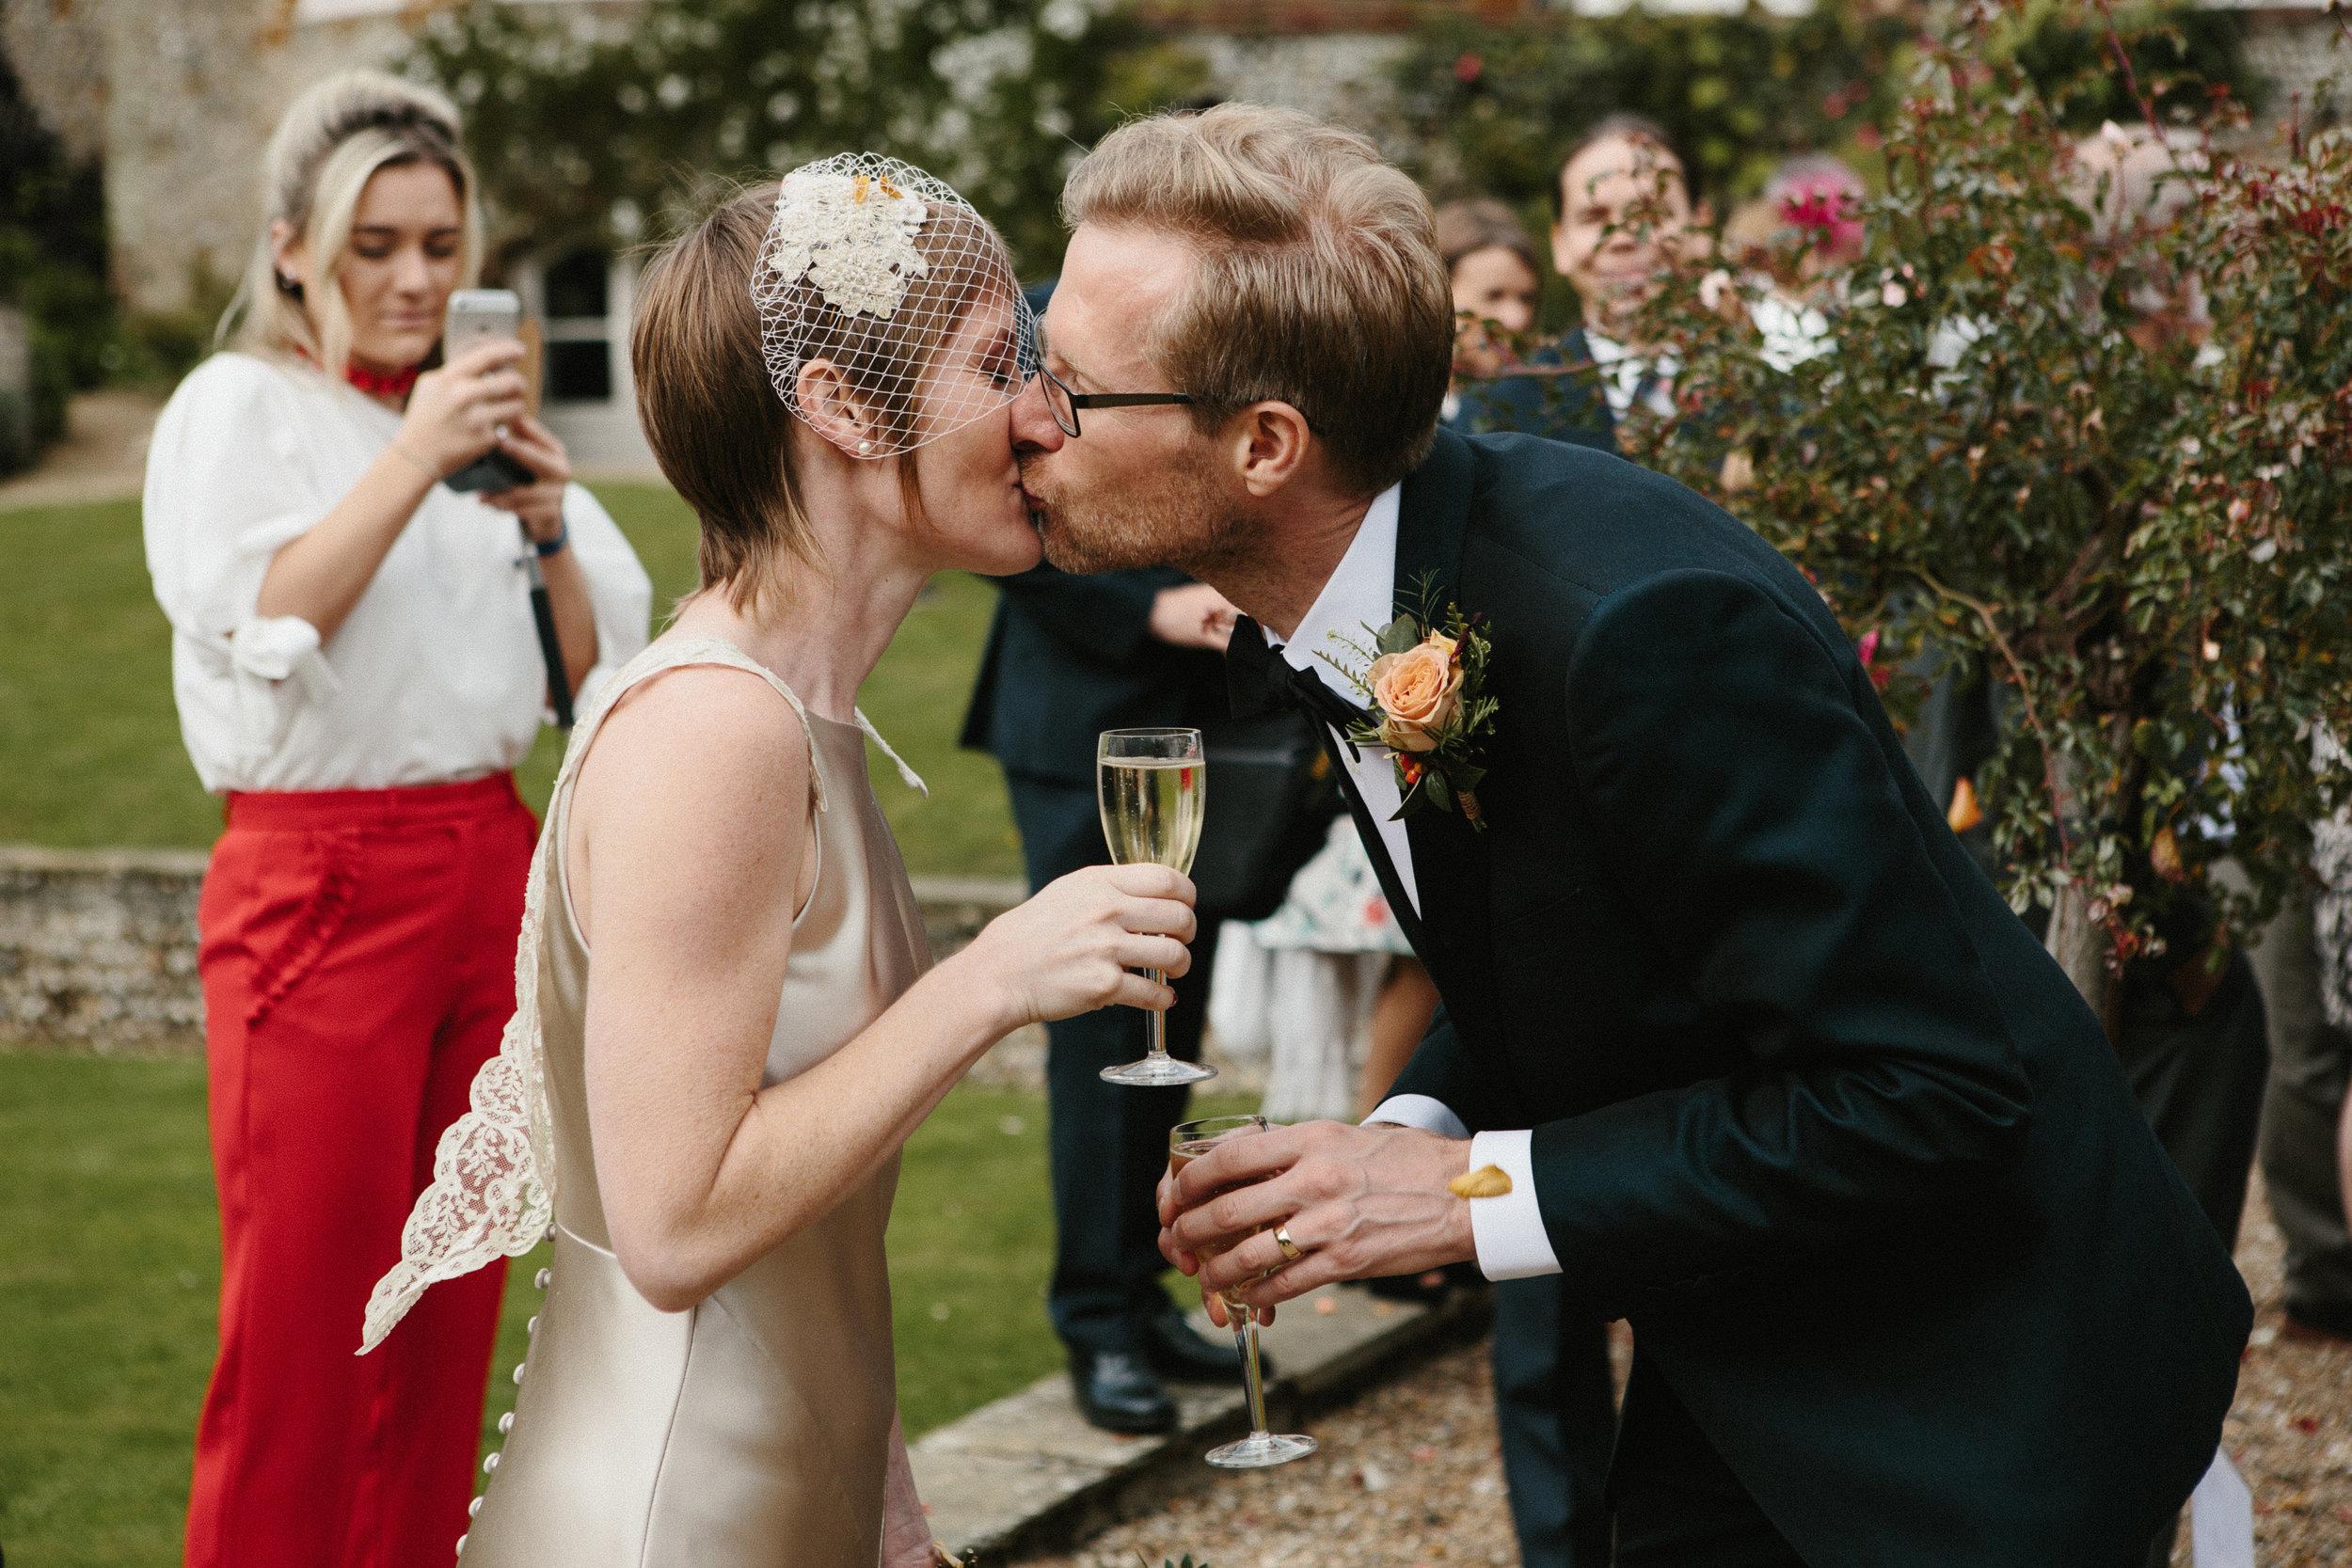 Kate-Beaumont-Sheffield-Honeysuckle-bias-cut-wedding-dress-oyster-Rosie17.jpg